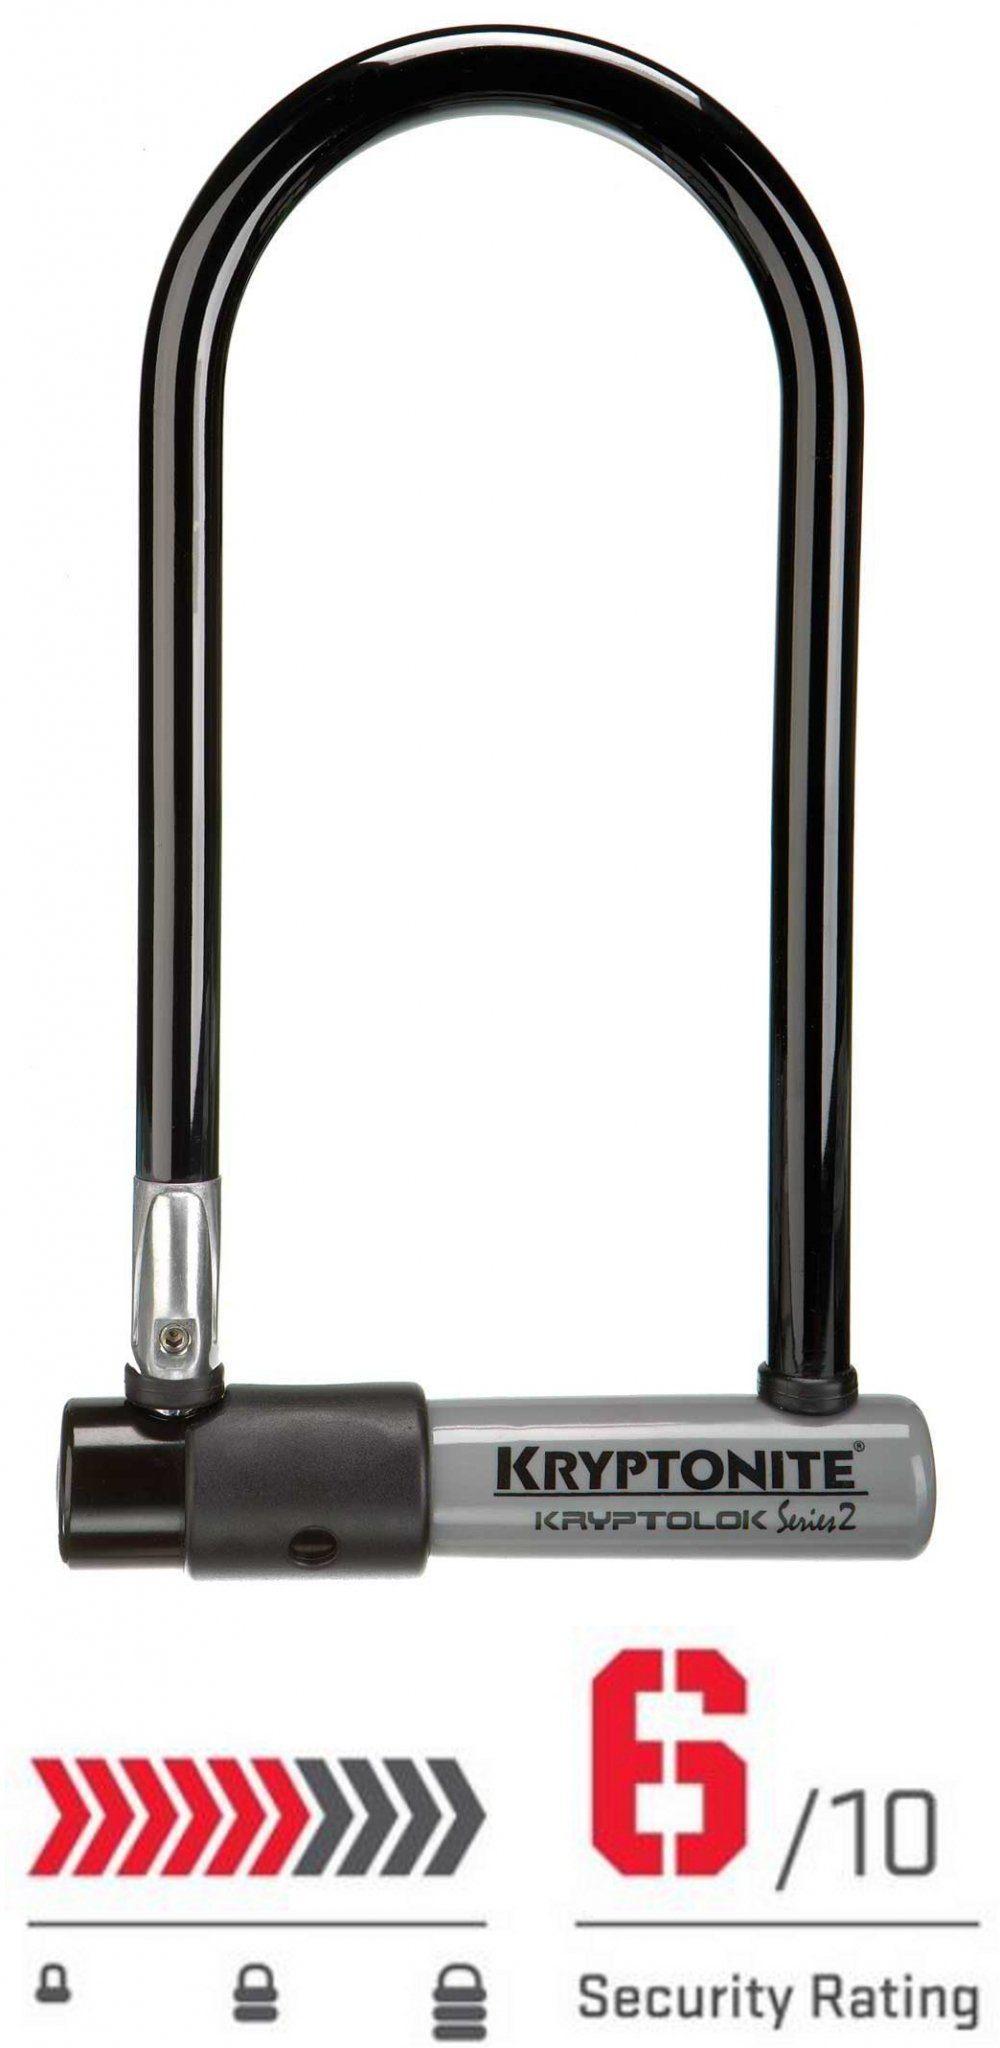 Kryptonite Fahrradschloss »KryptoLok Standard«